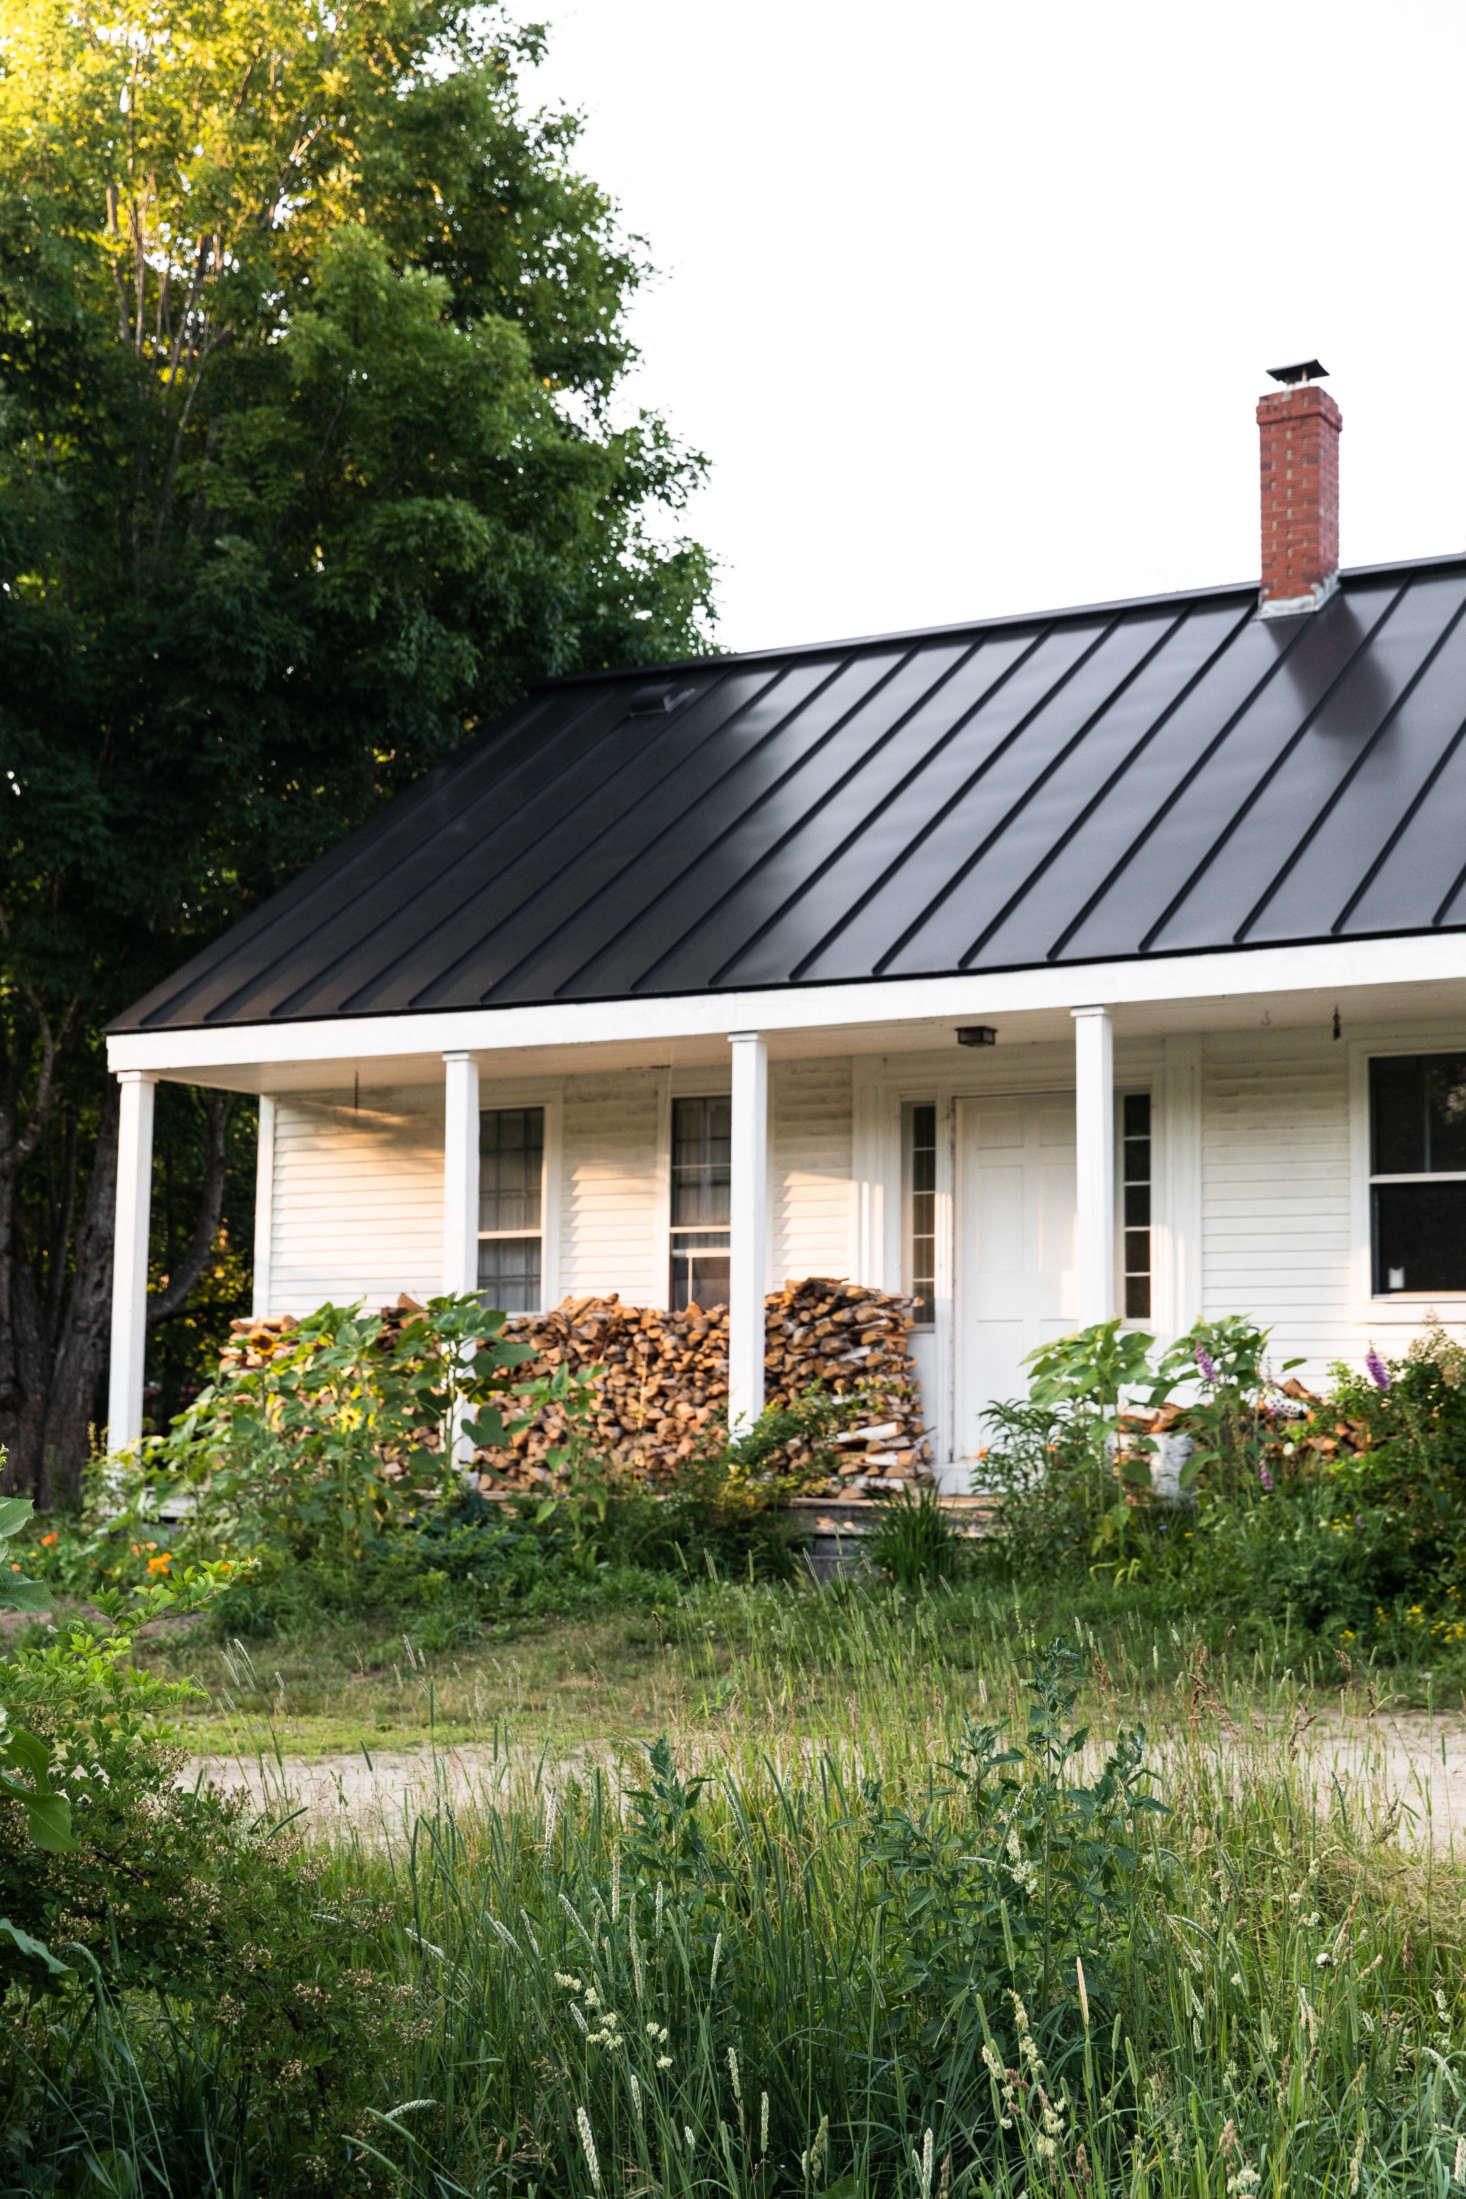 The House That Craigslist Built: A Bare-Bones Farmhouse in Midcoast on maine saltbox plans, maine barn plans, maine outhouse plans, maine farm houses,